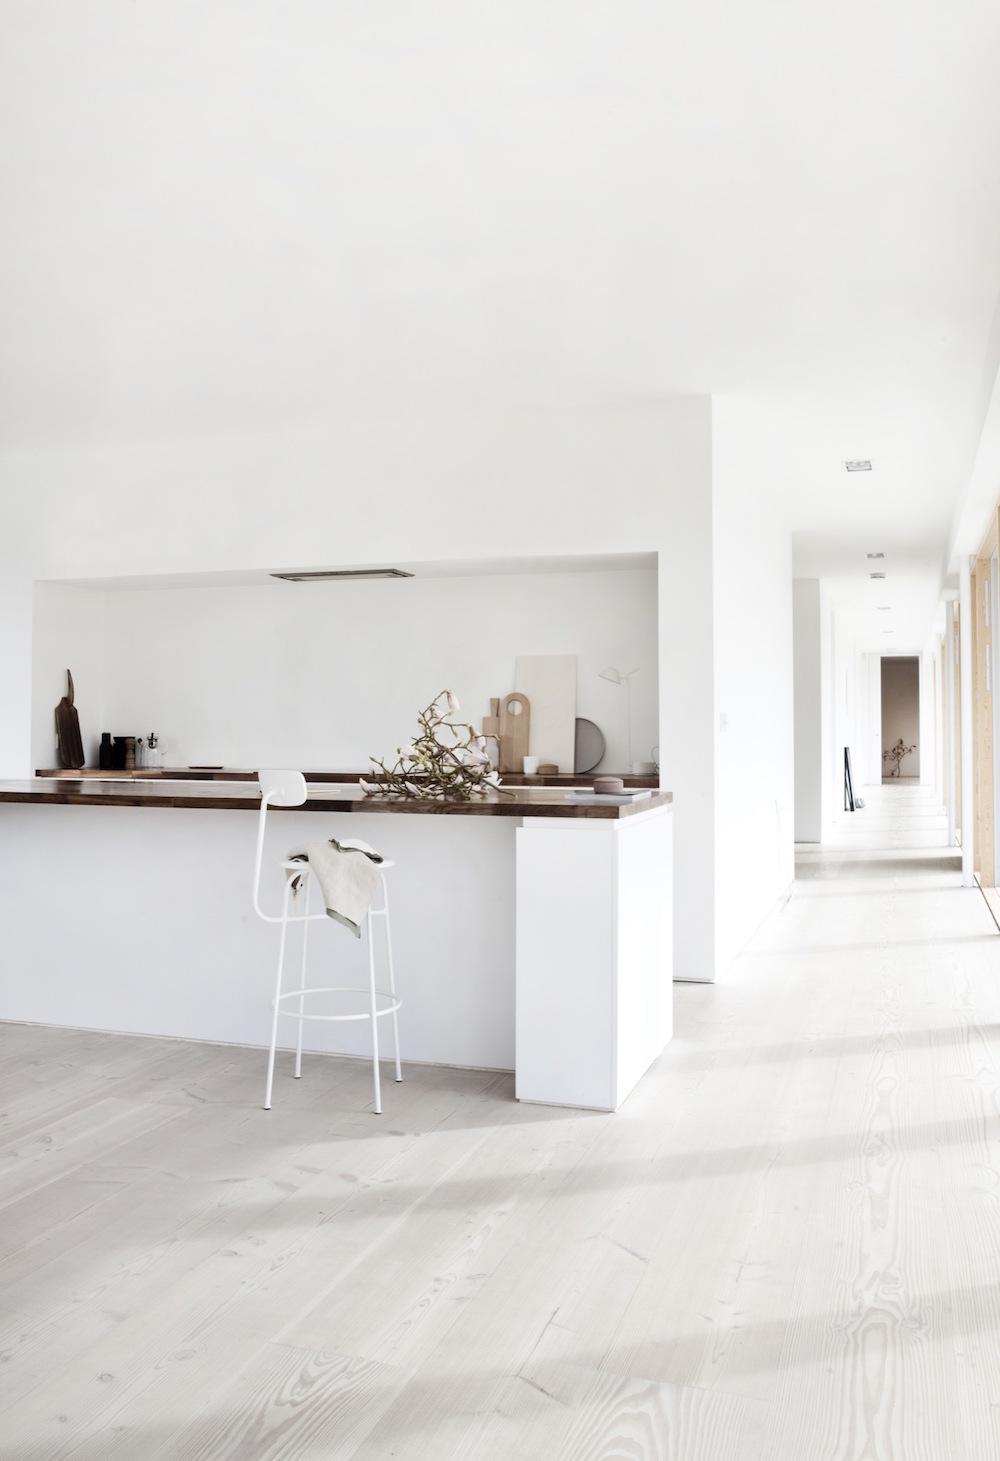 reydon-grove-farm-by-norm-architects-5